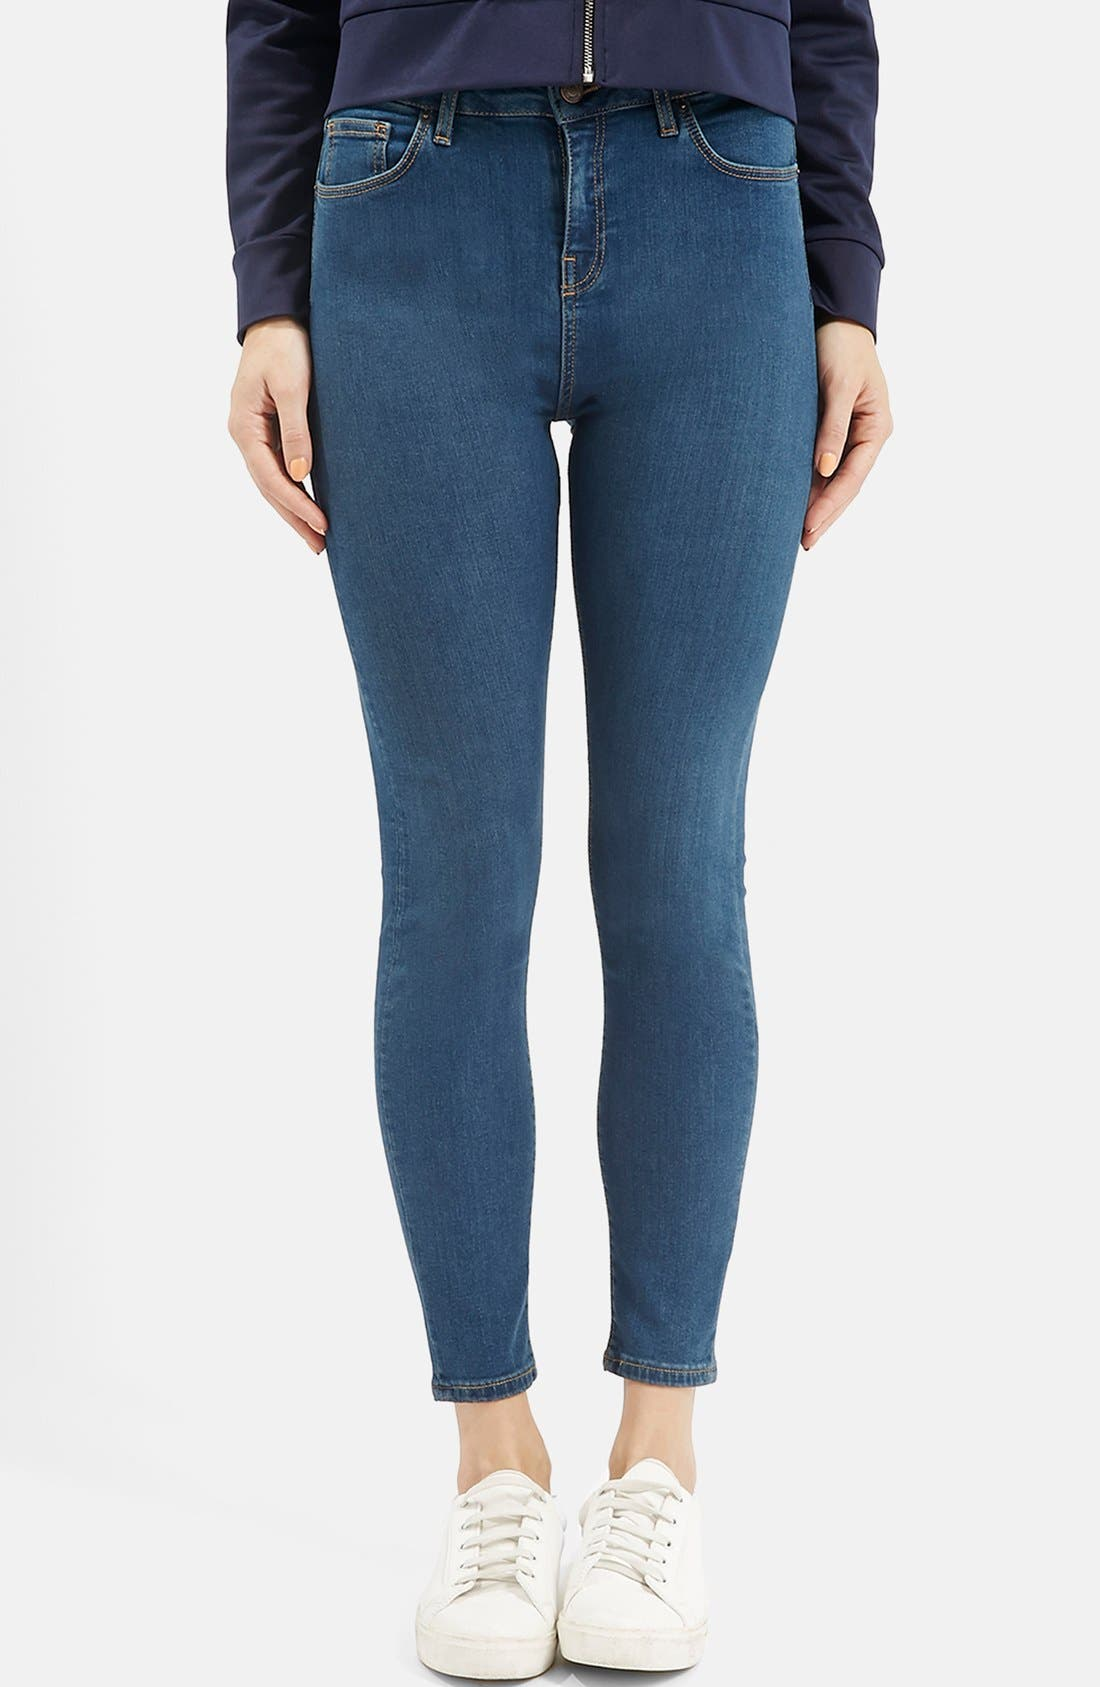 Alternate Image 1 Selected - Topshop Moto 'Jamie' High Rise Skinny Jeans (Blue)